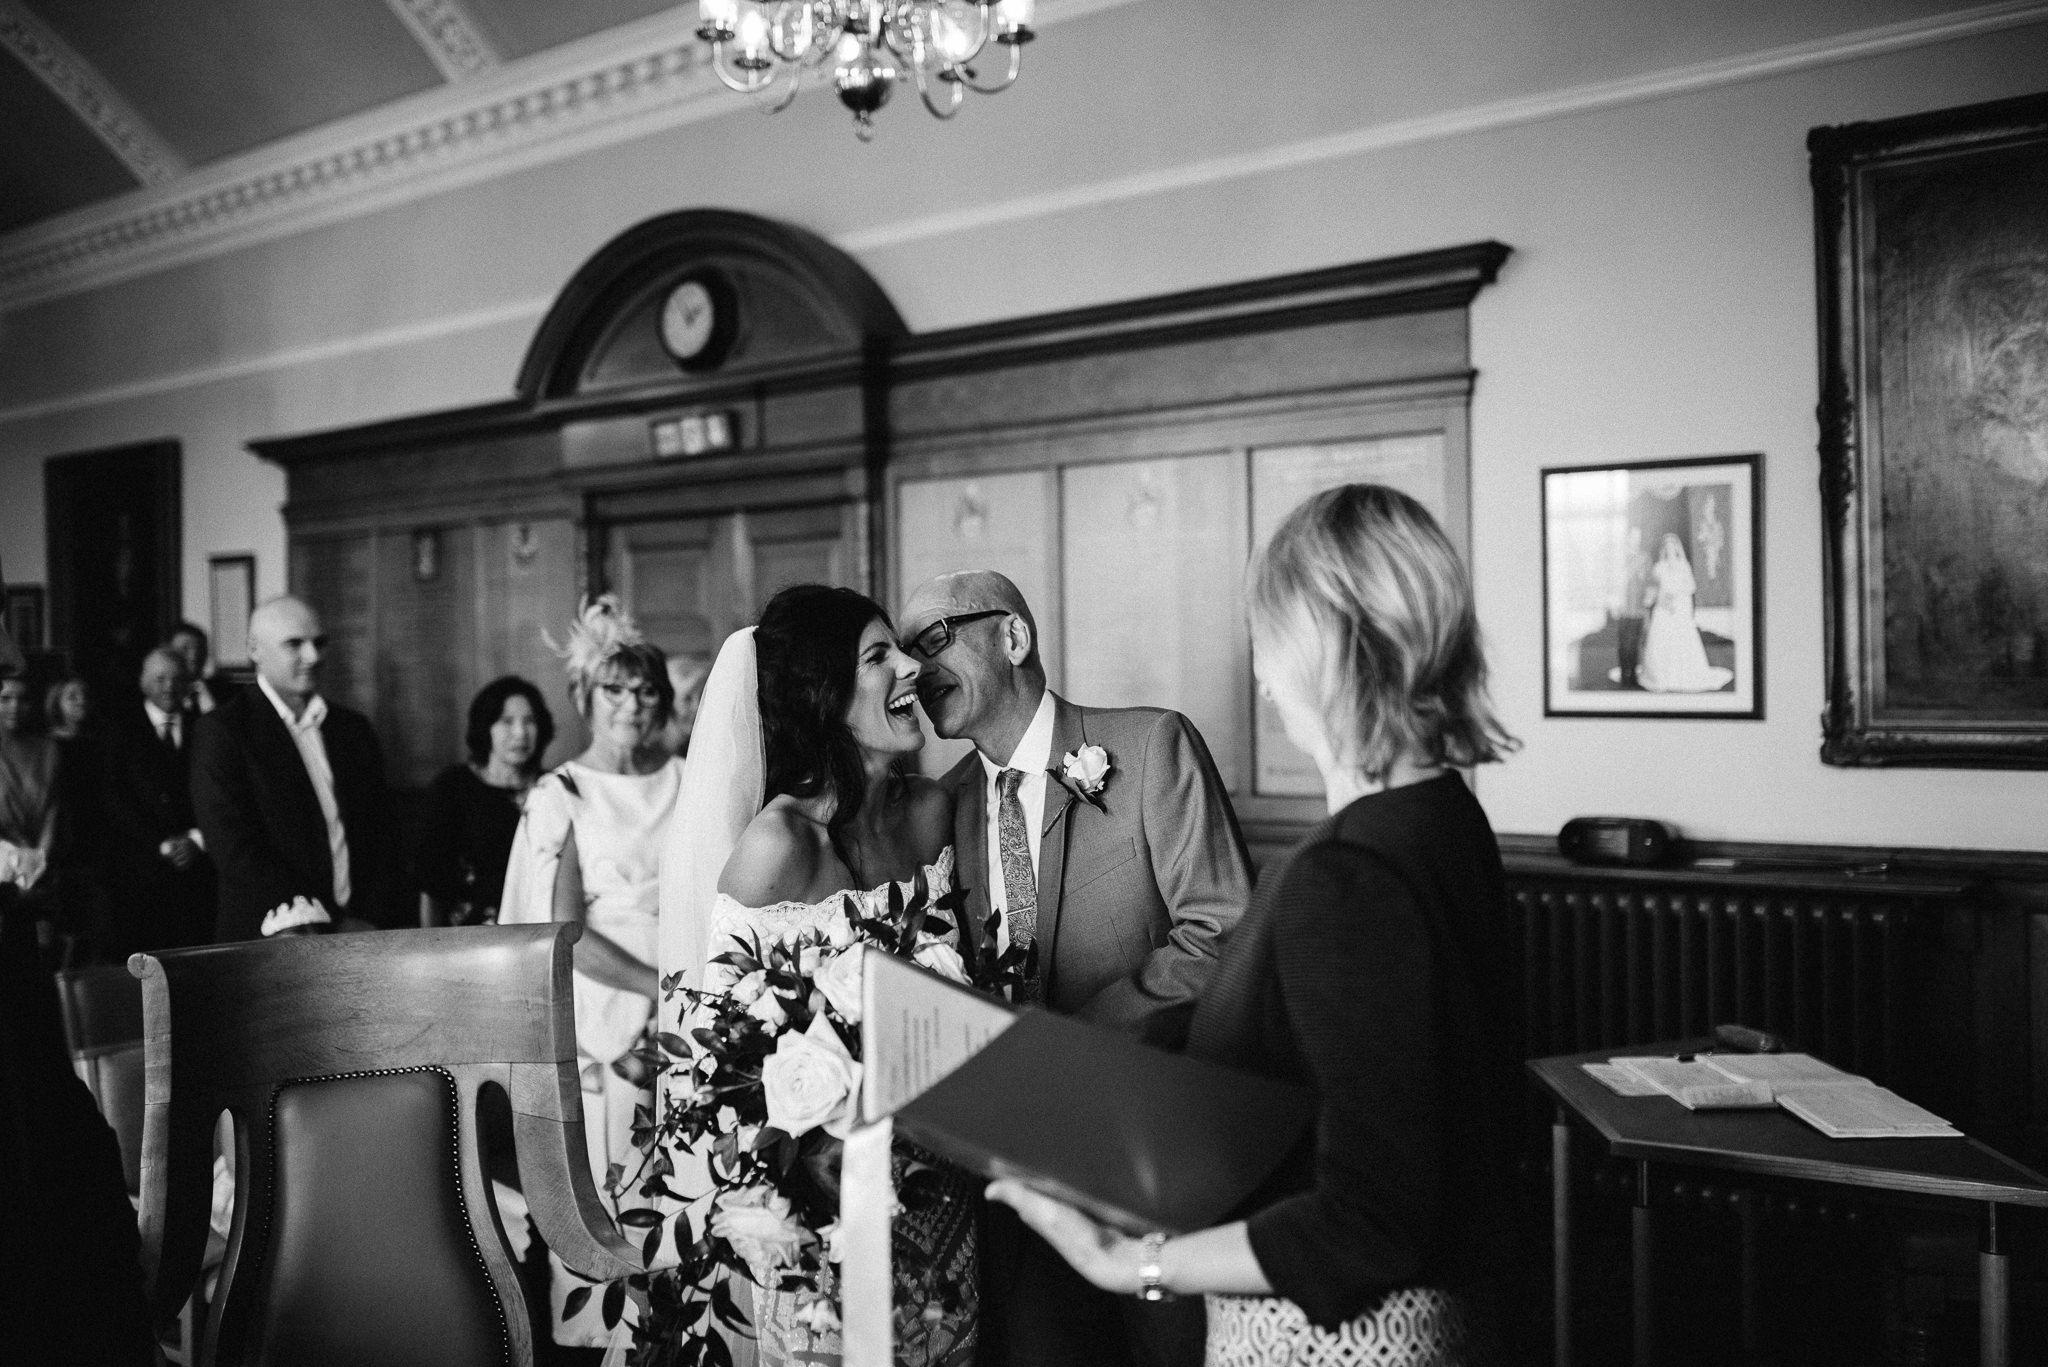 cleethorpes-town-hall-wedding.jpg